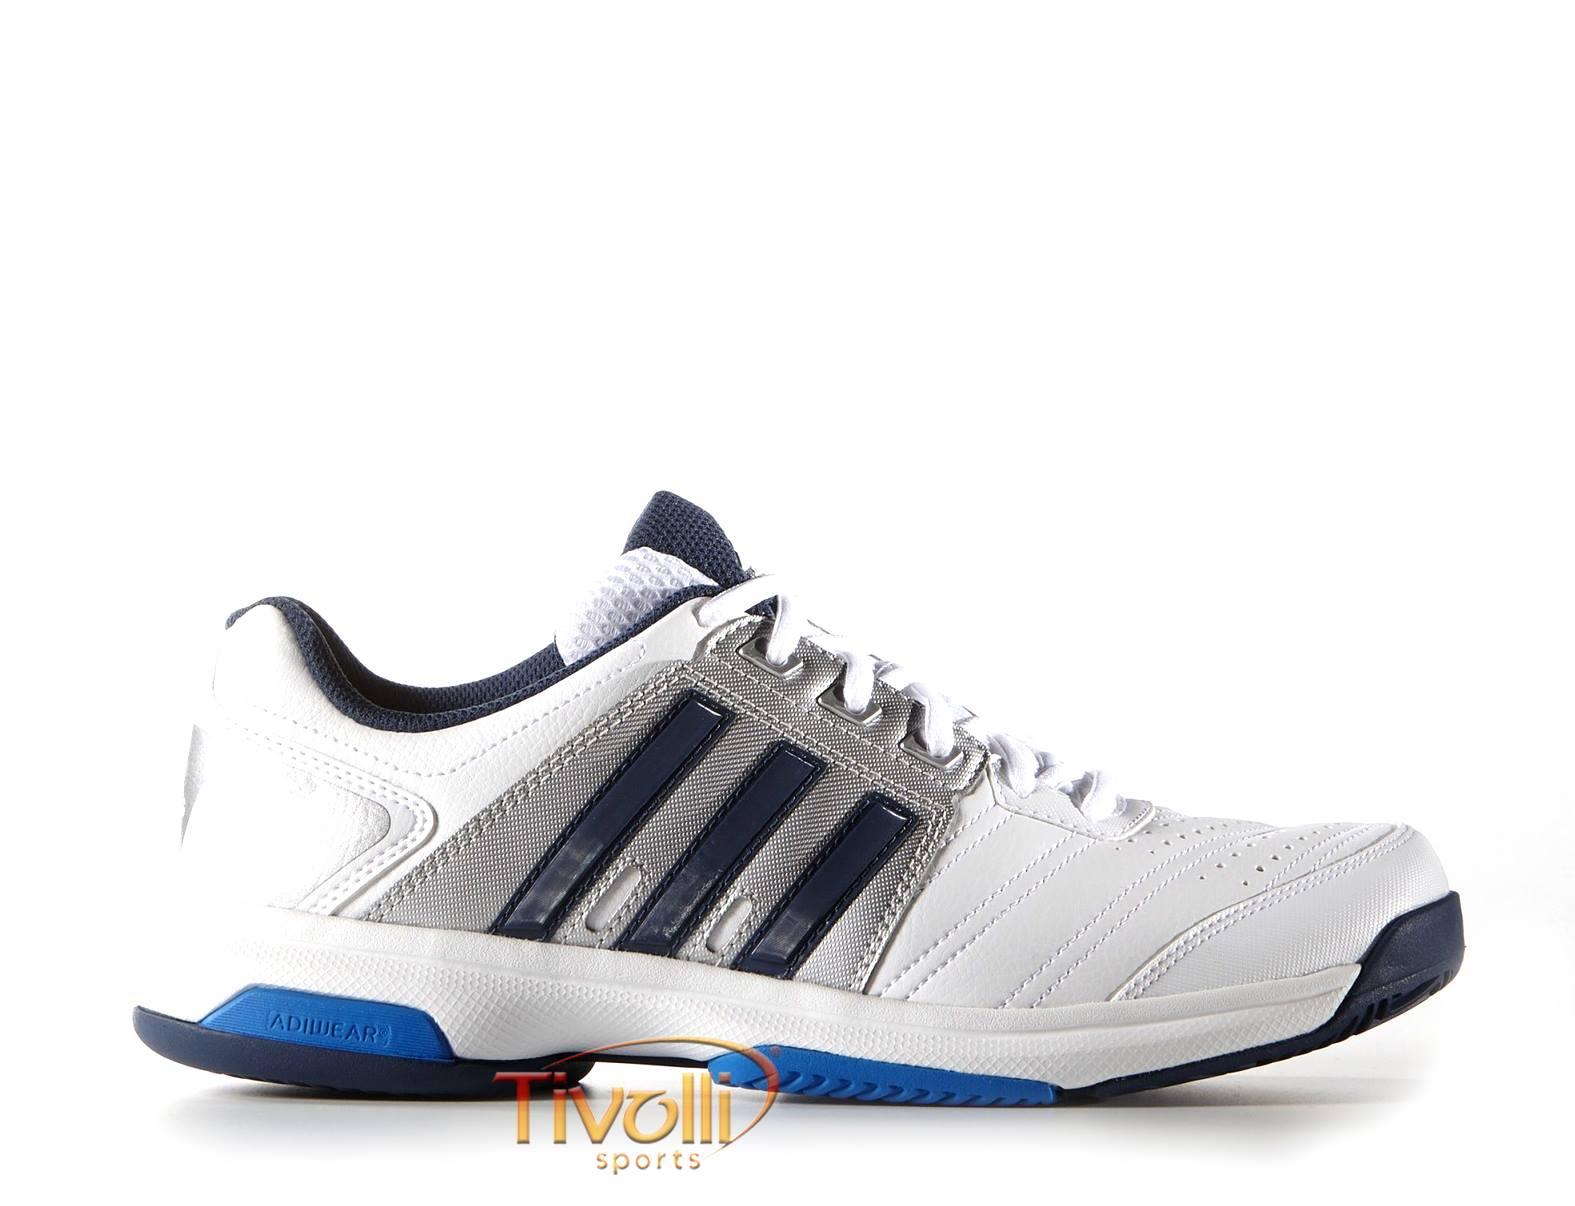 daf6dee4f3 Tênis Adidas Barricade Approach STR > branco, prata e azul >